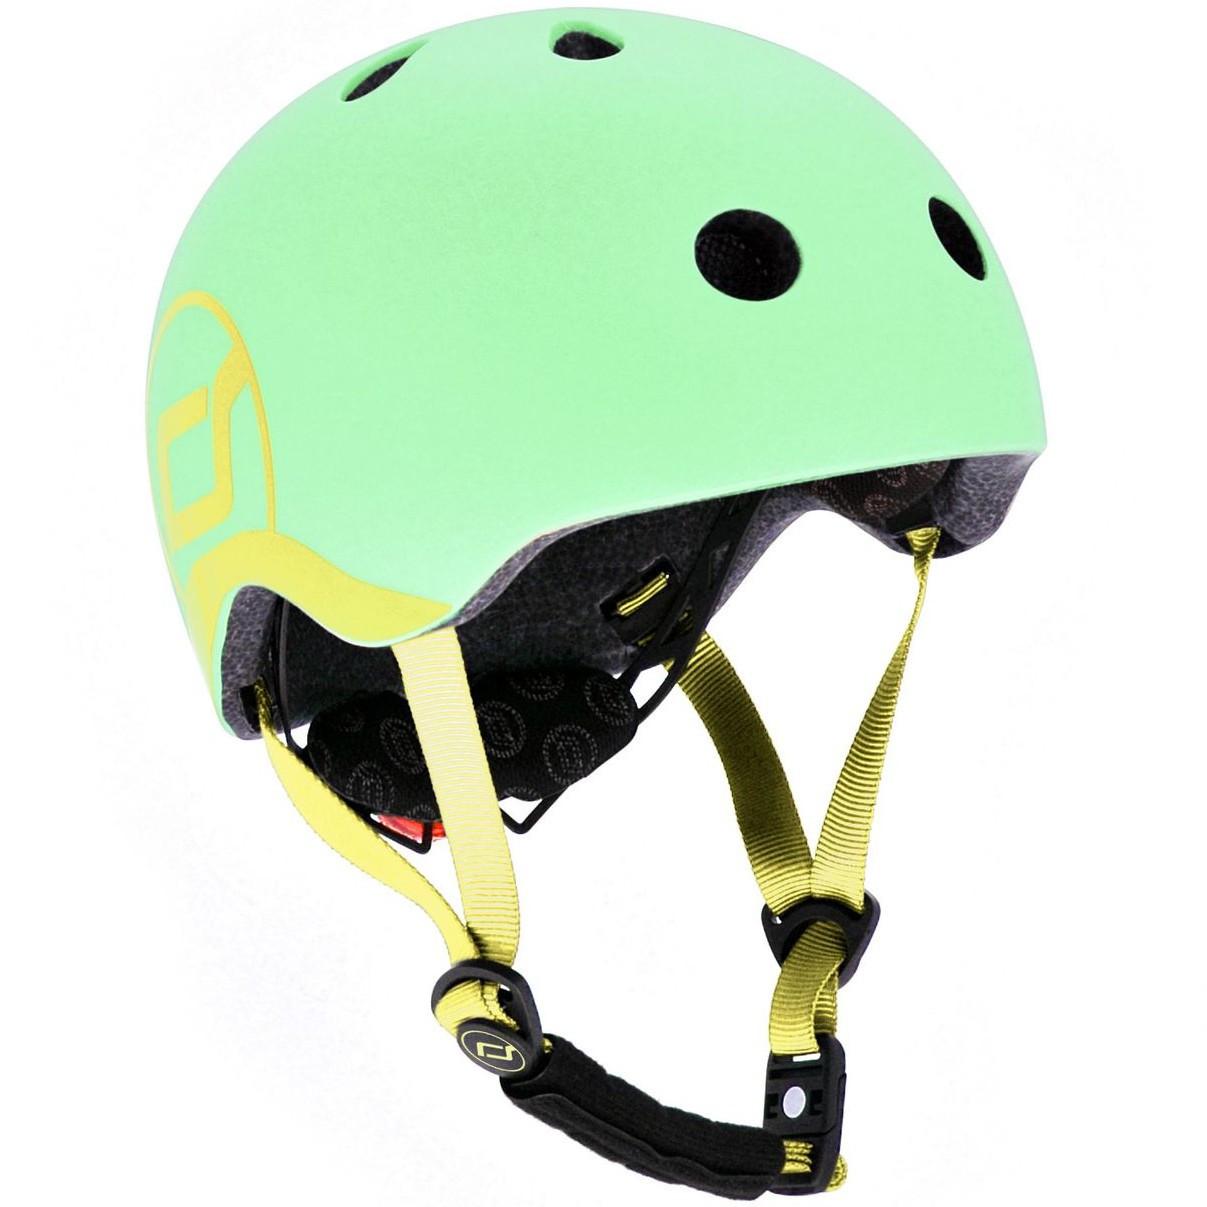 Scoot and Ride Детский защитный шлем киви kiwi Kinder Fahrradhelm  (S-M)